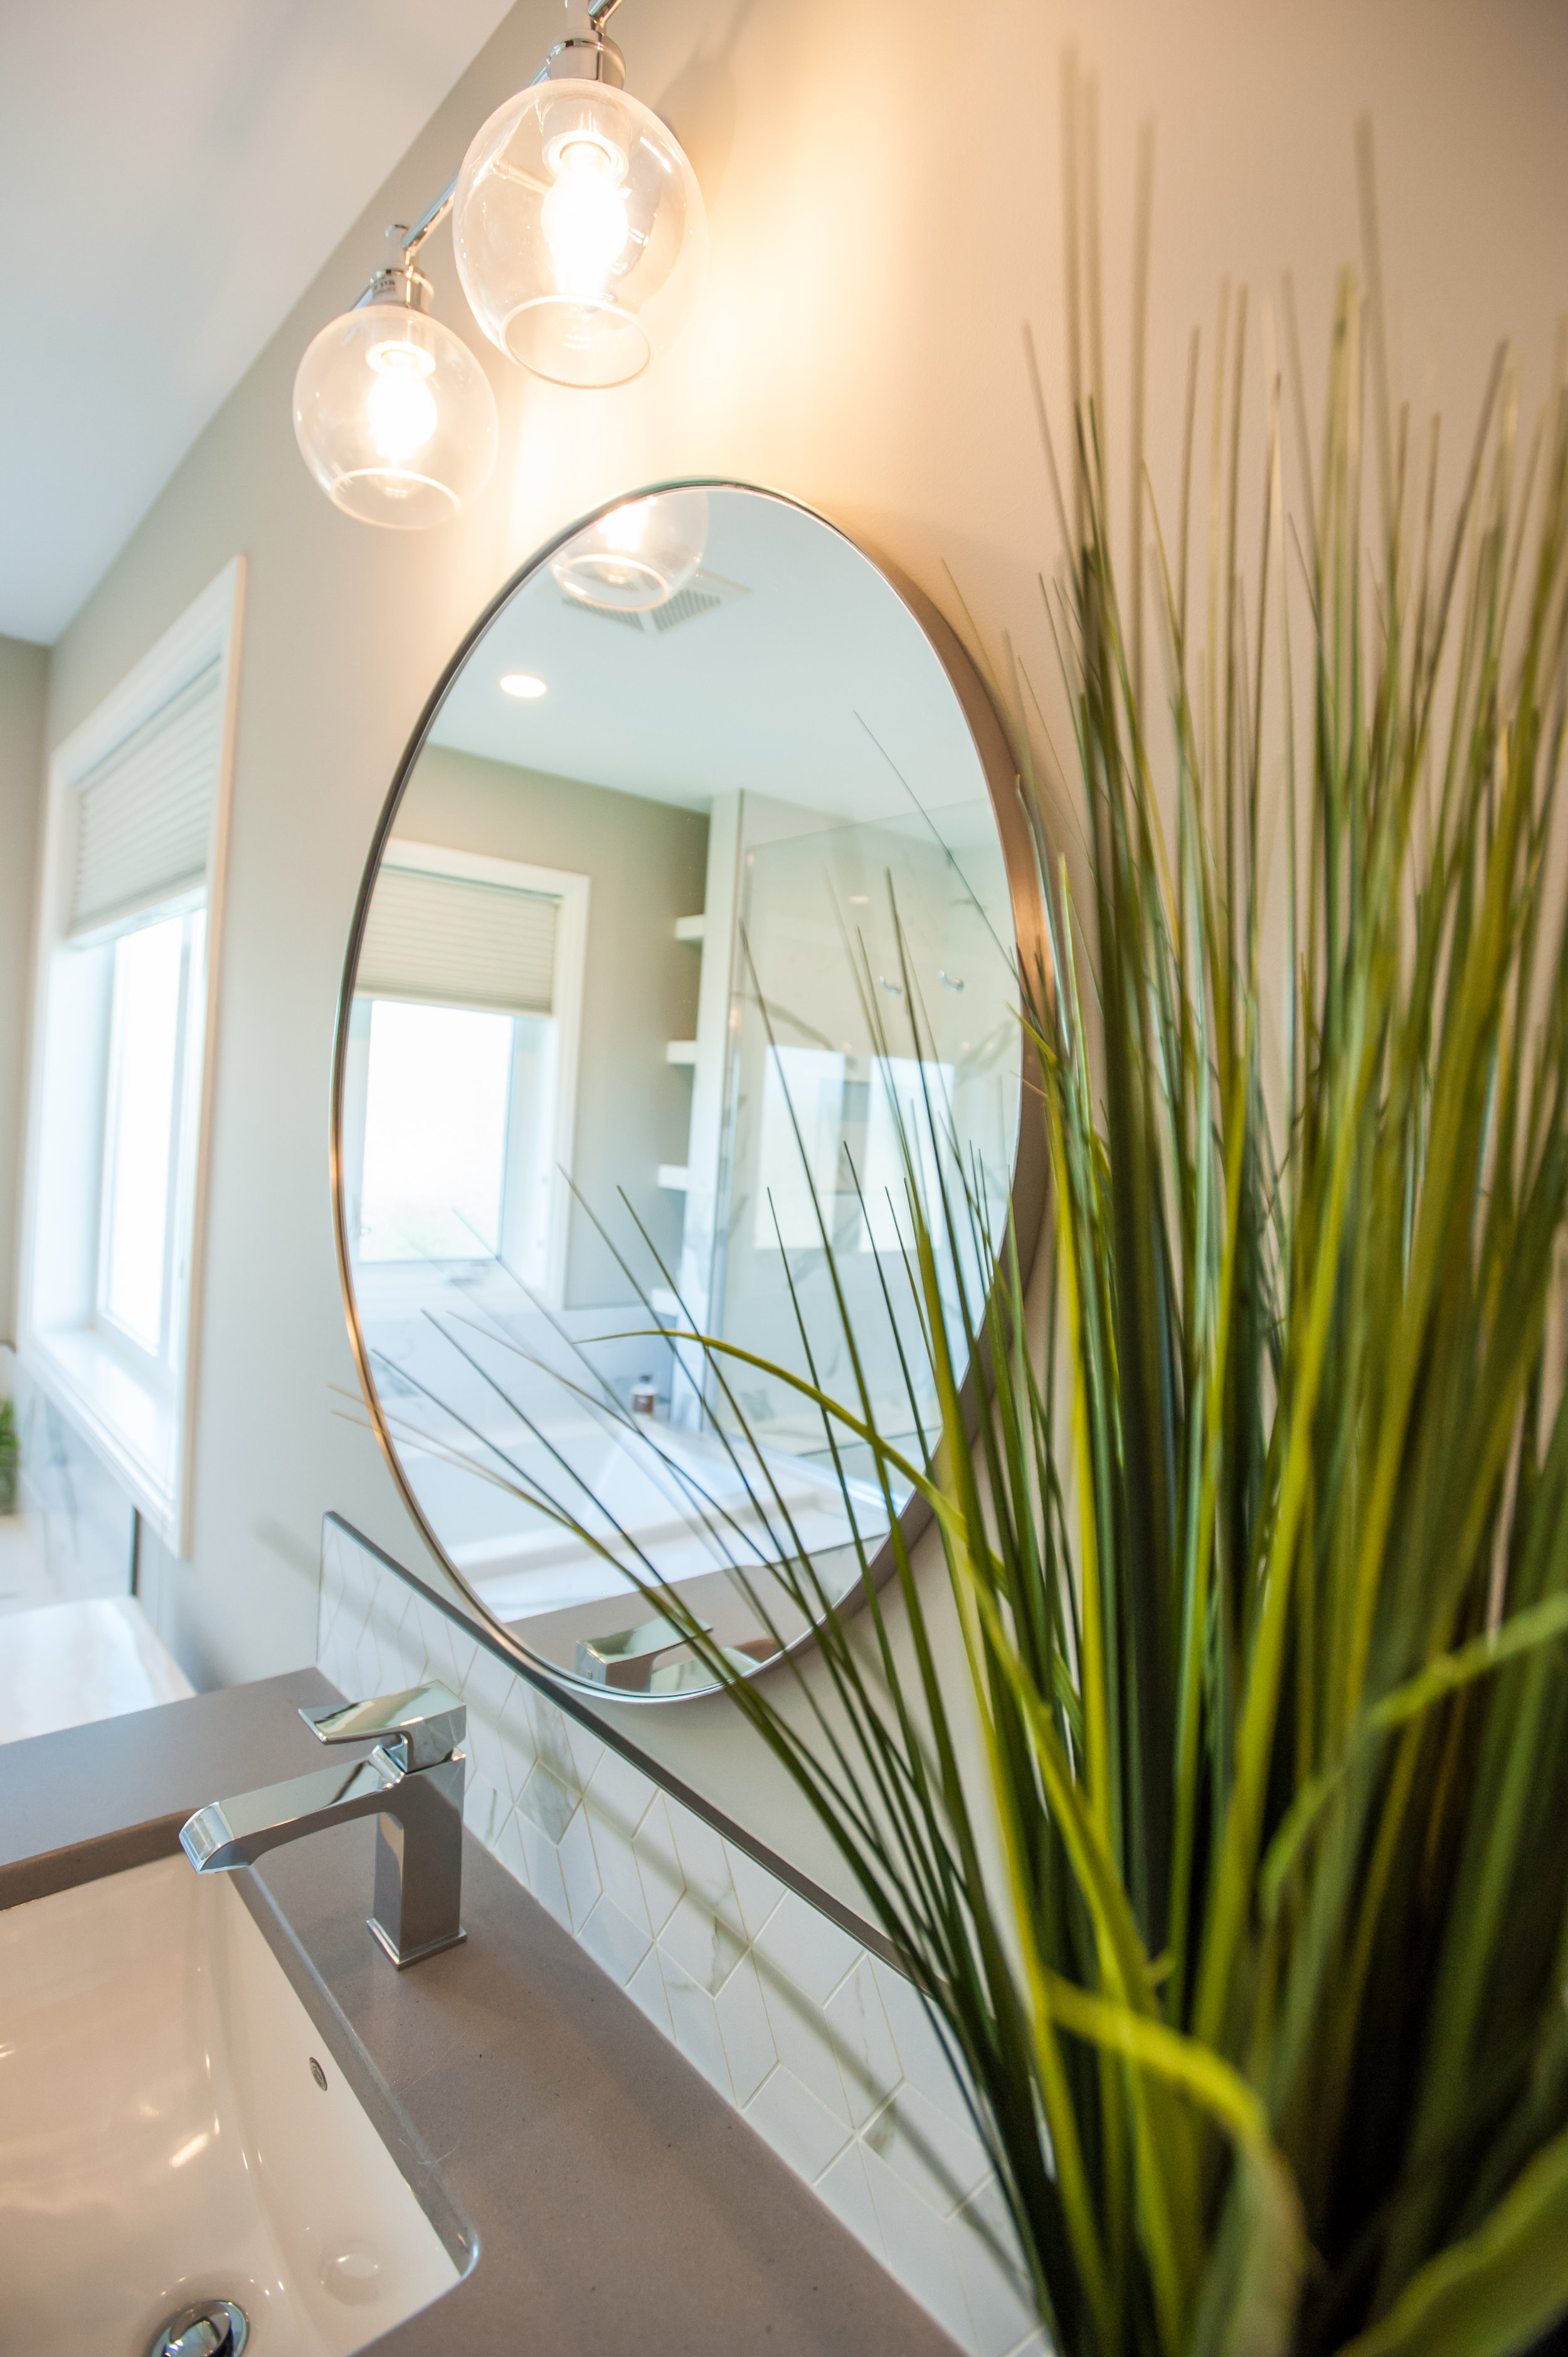 round_mirror_vanity_bath_reno_raw_concrete